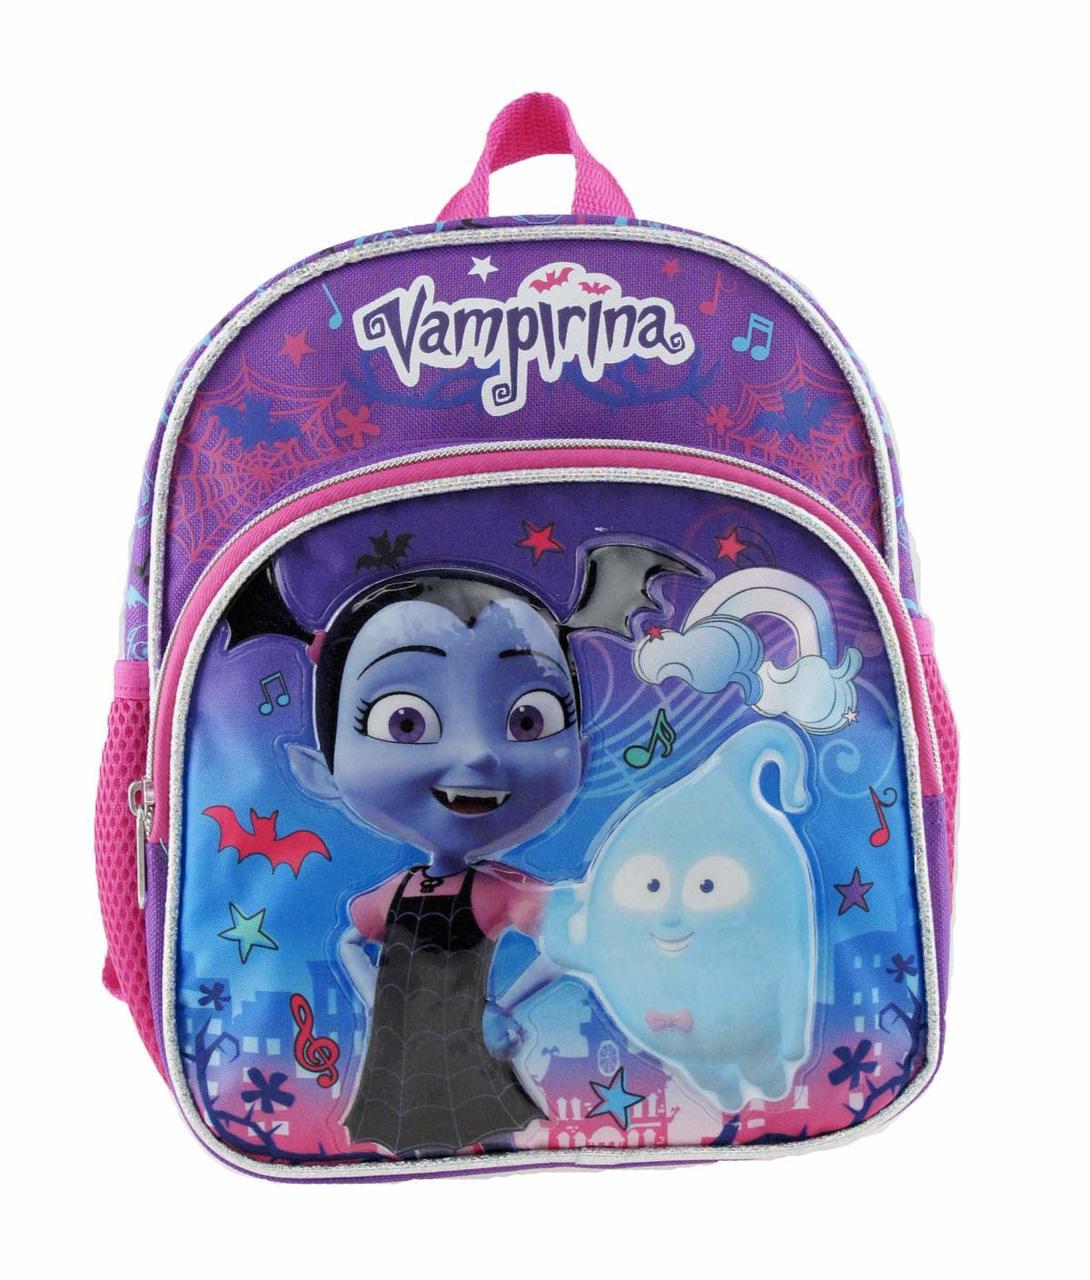 8d9b5105ea7 Mini Backpack Disney Vampirina Shiny 10